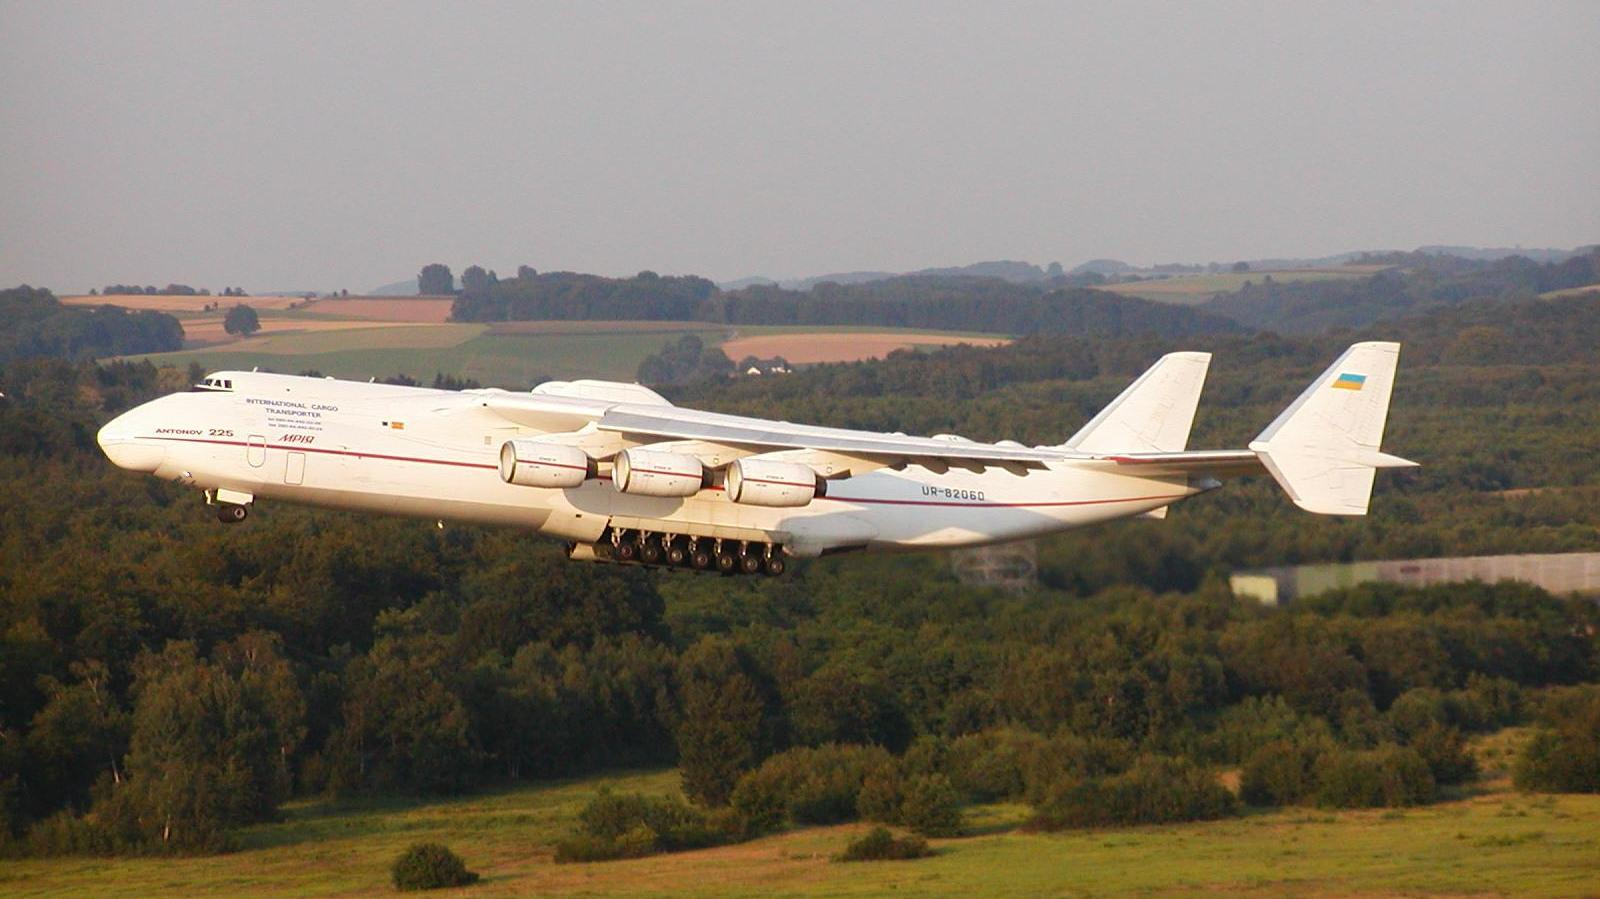 http://2.bp.blogspot.com/-o6iclHt5_AA/TZCgqIsb_QI/AAAAAAAAFJs/xwkdmLX3mgw/s1600/an225+largest+aircraft+ever+3.jpg